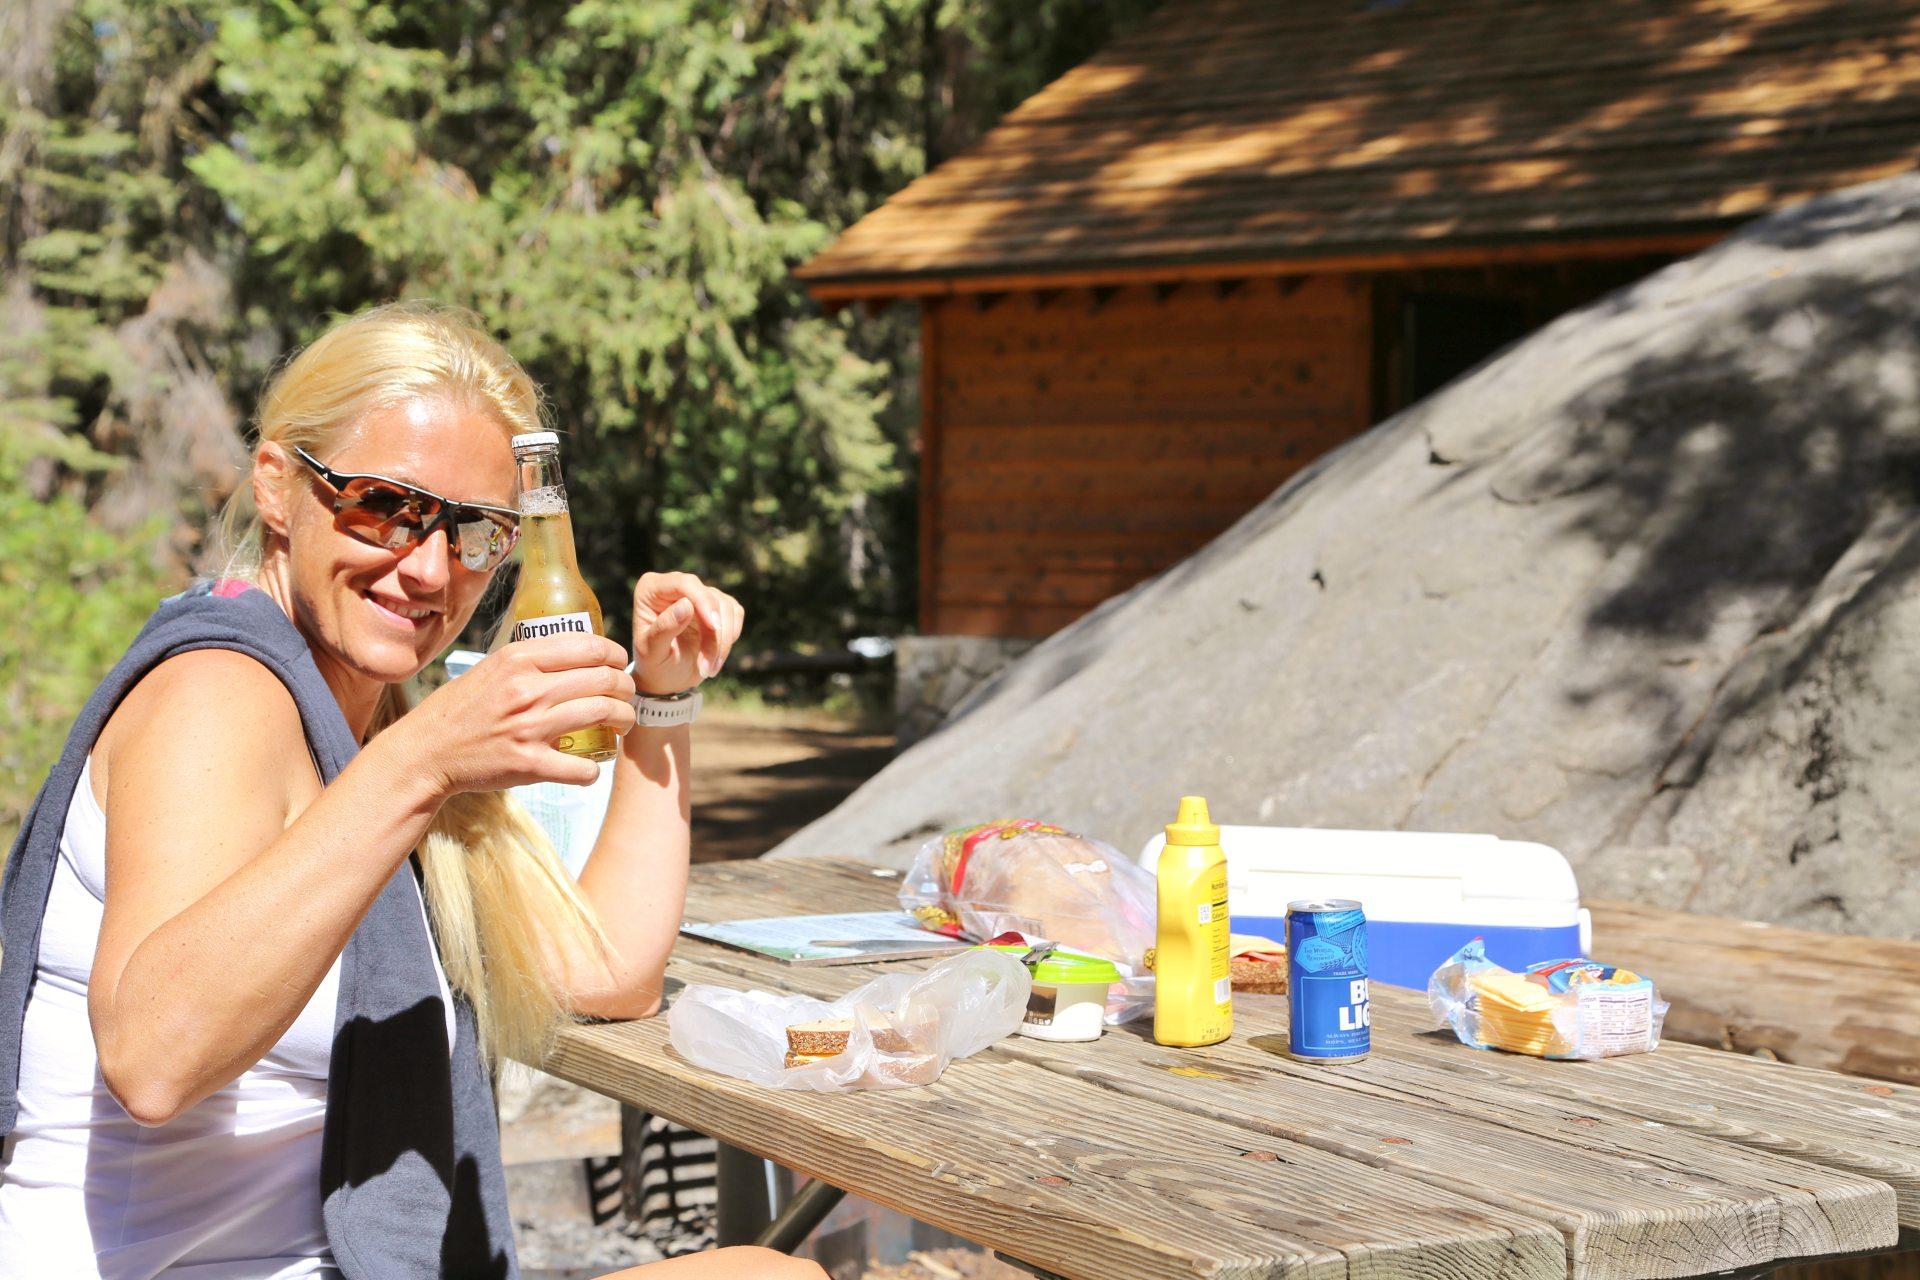 Pinewood Picnic Area - Blondine, Kalifornien, Personen, Portrait, Porträt, Sequoia National Park - HOFBAUER-HOFMANN Sofia - (Pinewood, Sequoia National Park, California, Vereinigte Staaten)